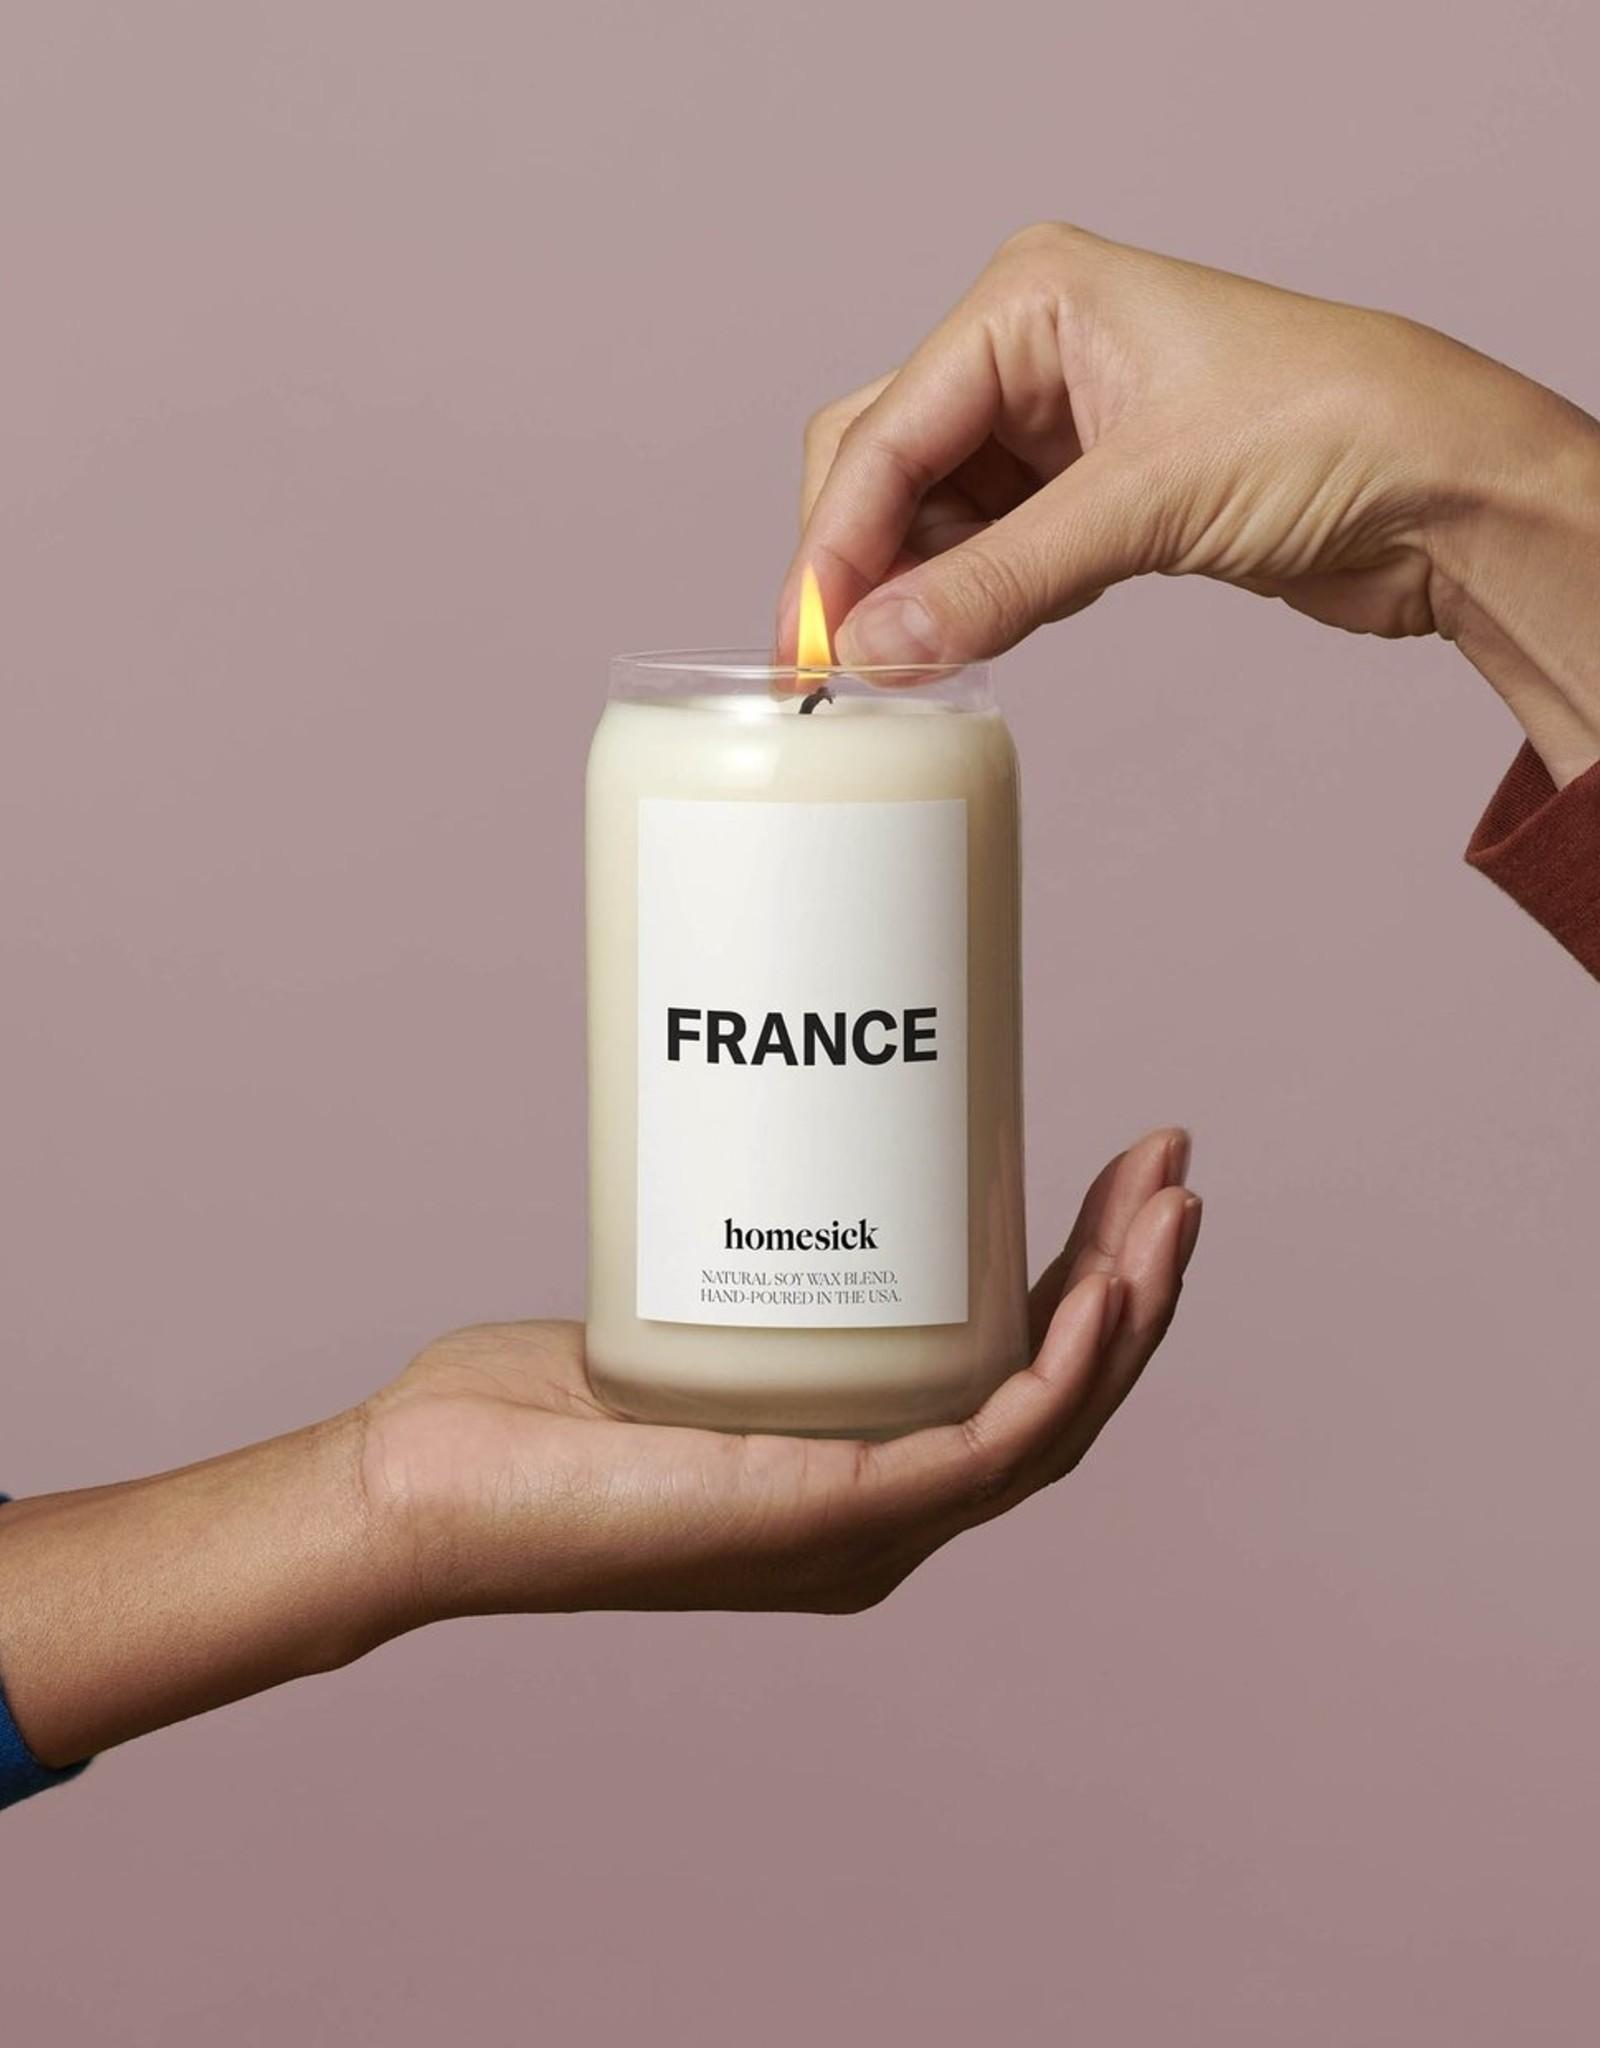 Homesick Homesick Candle France